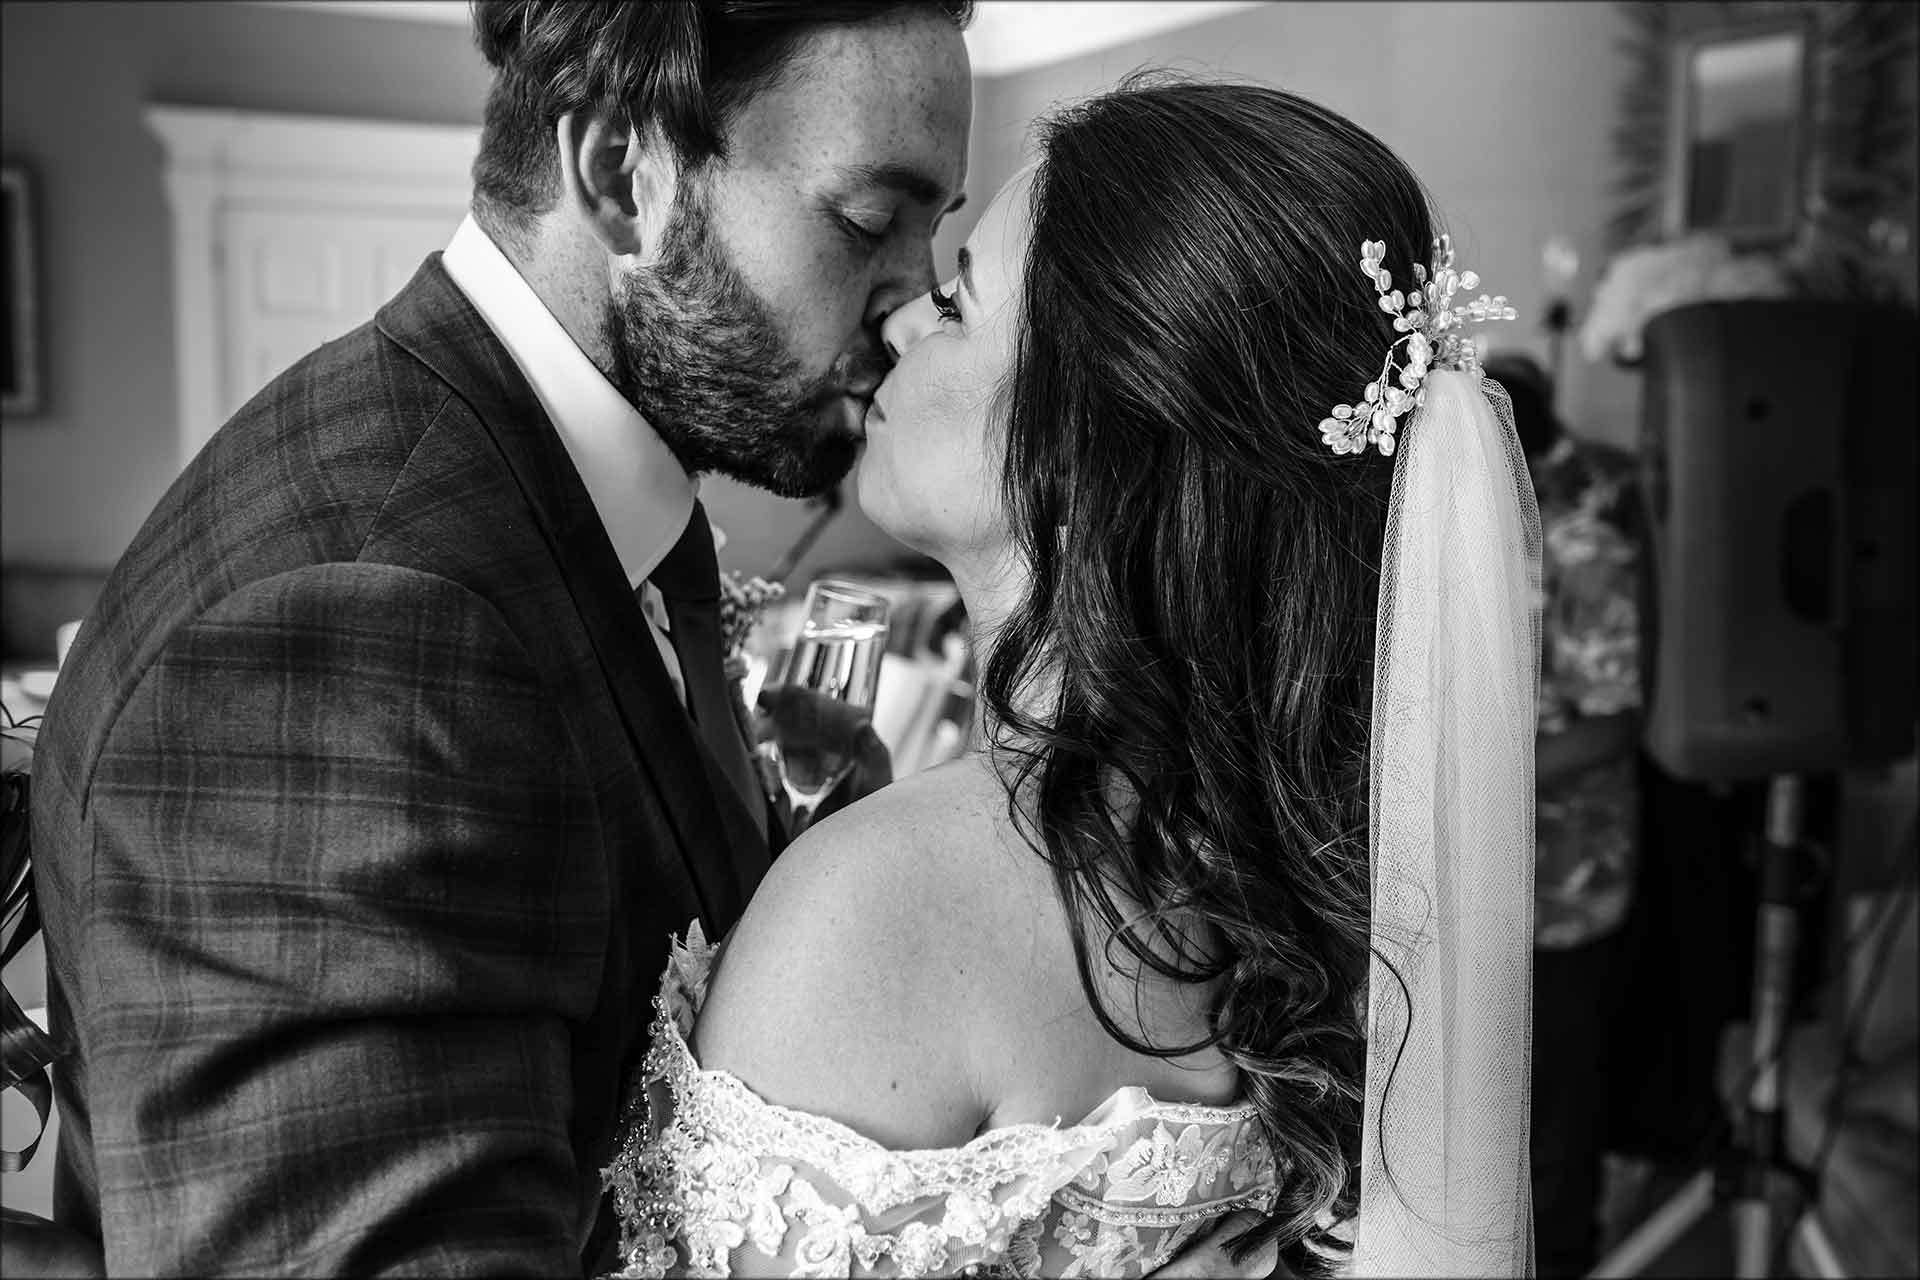 Bride and groom having a cheeky kiss